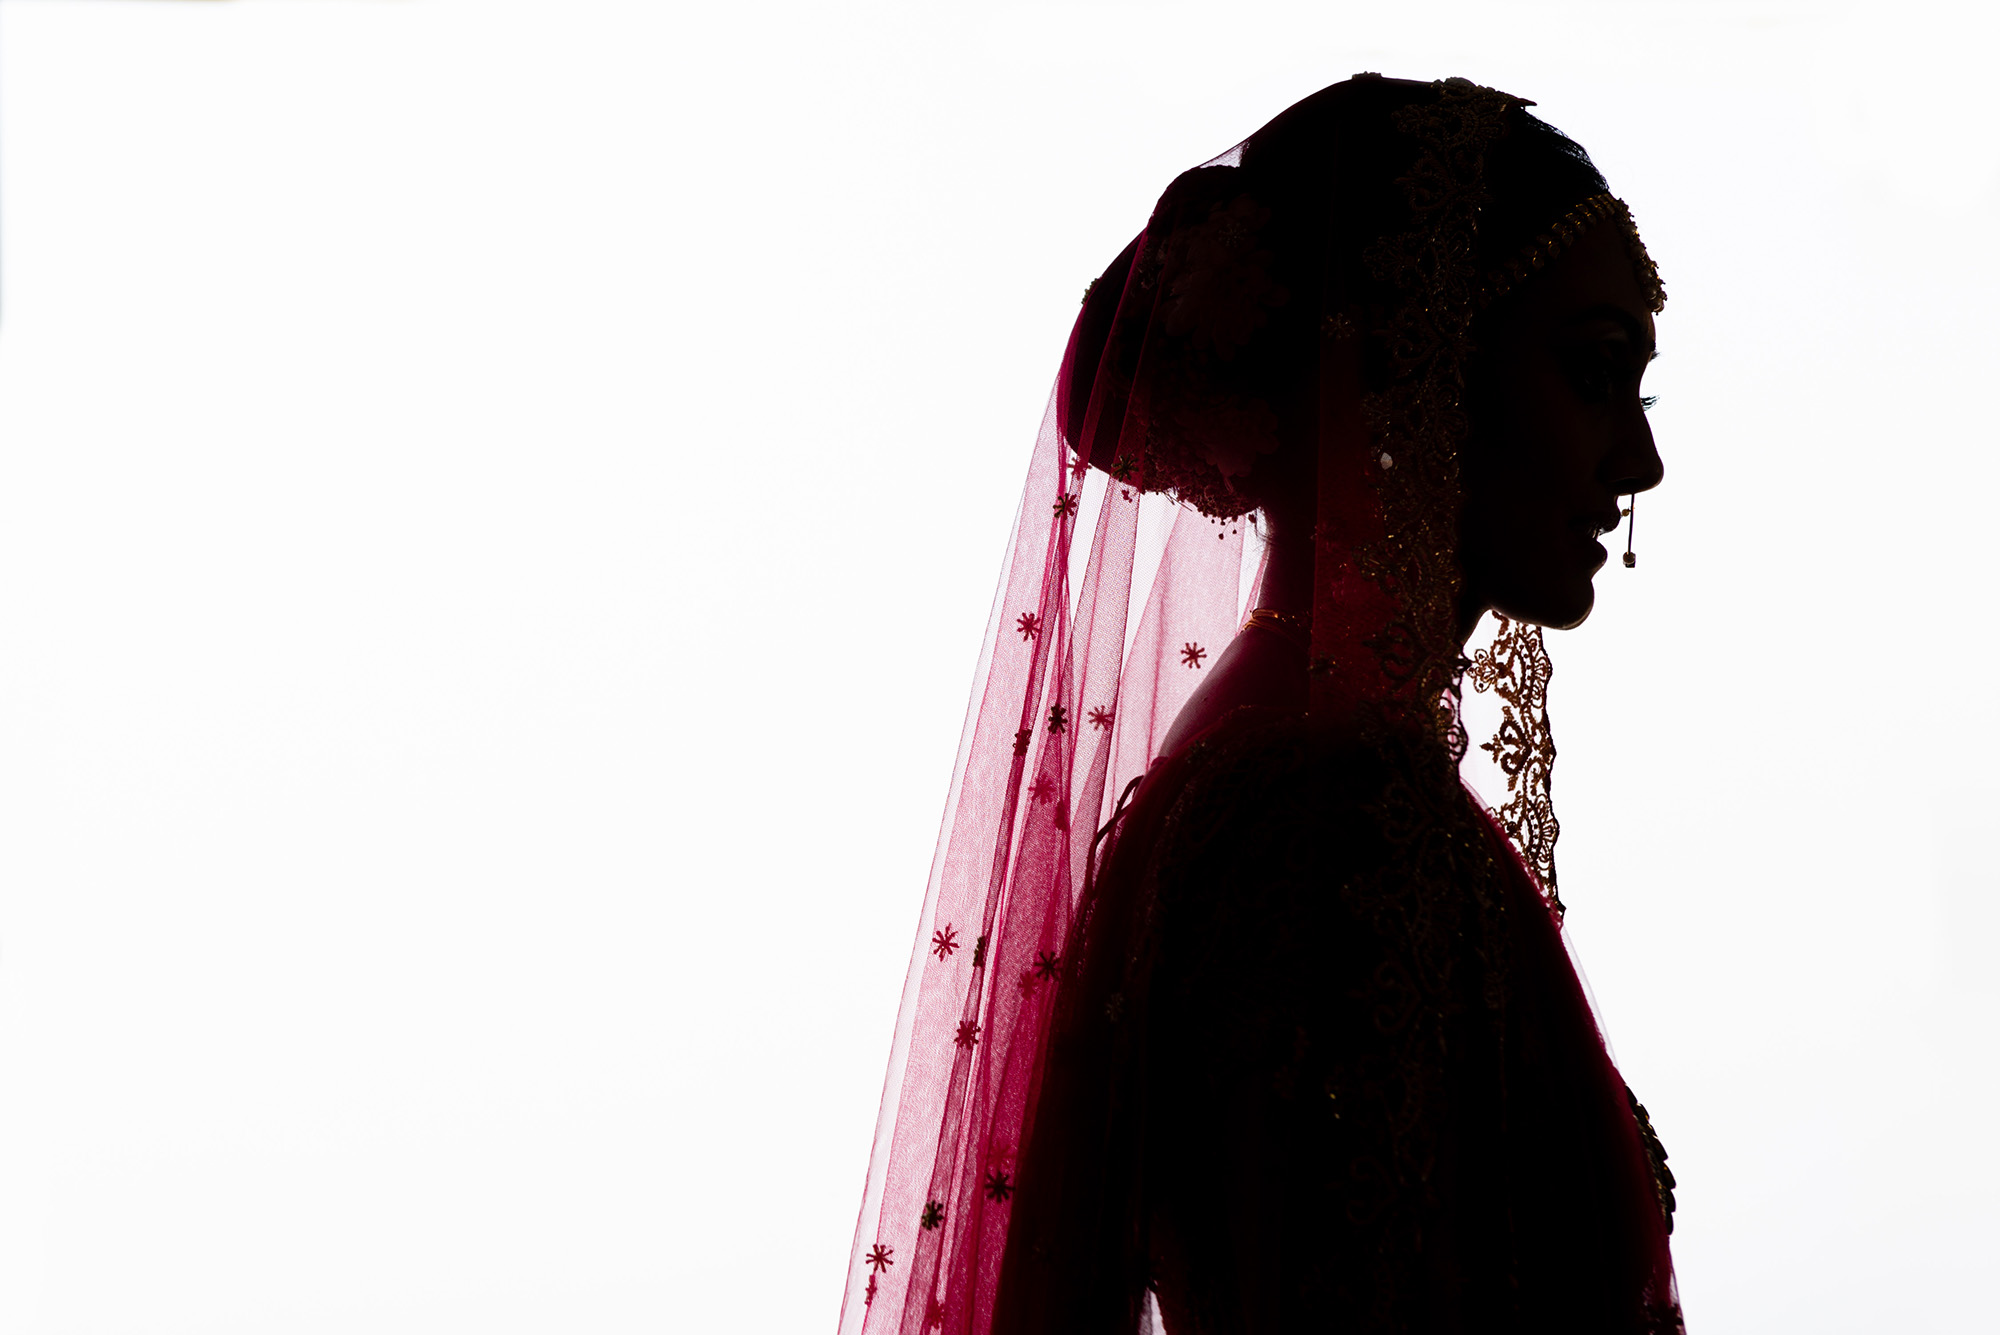 narracia-wygledacz-photographe-mariage-portfolio-20.jpg